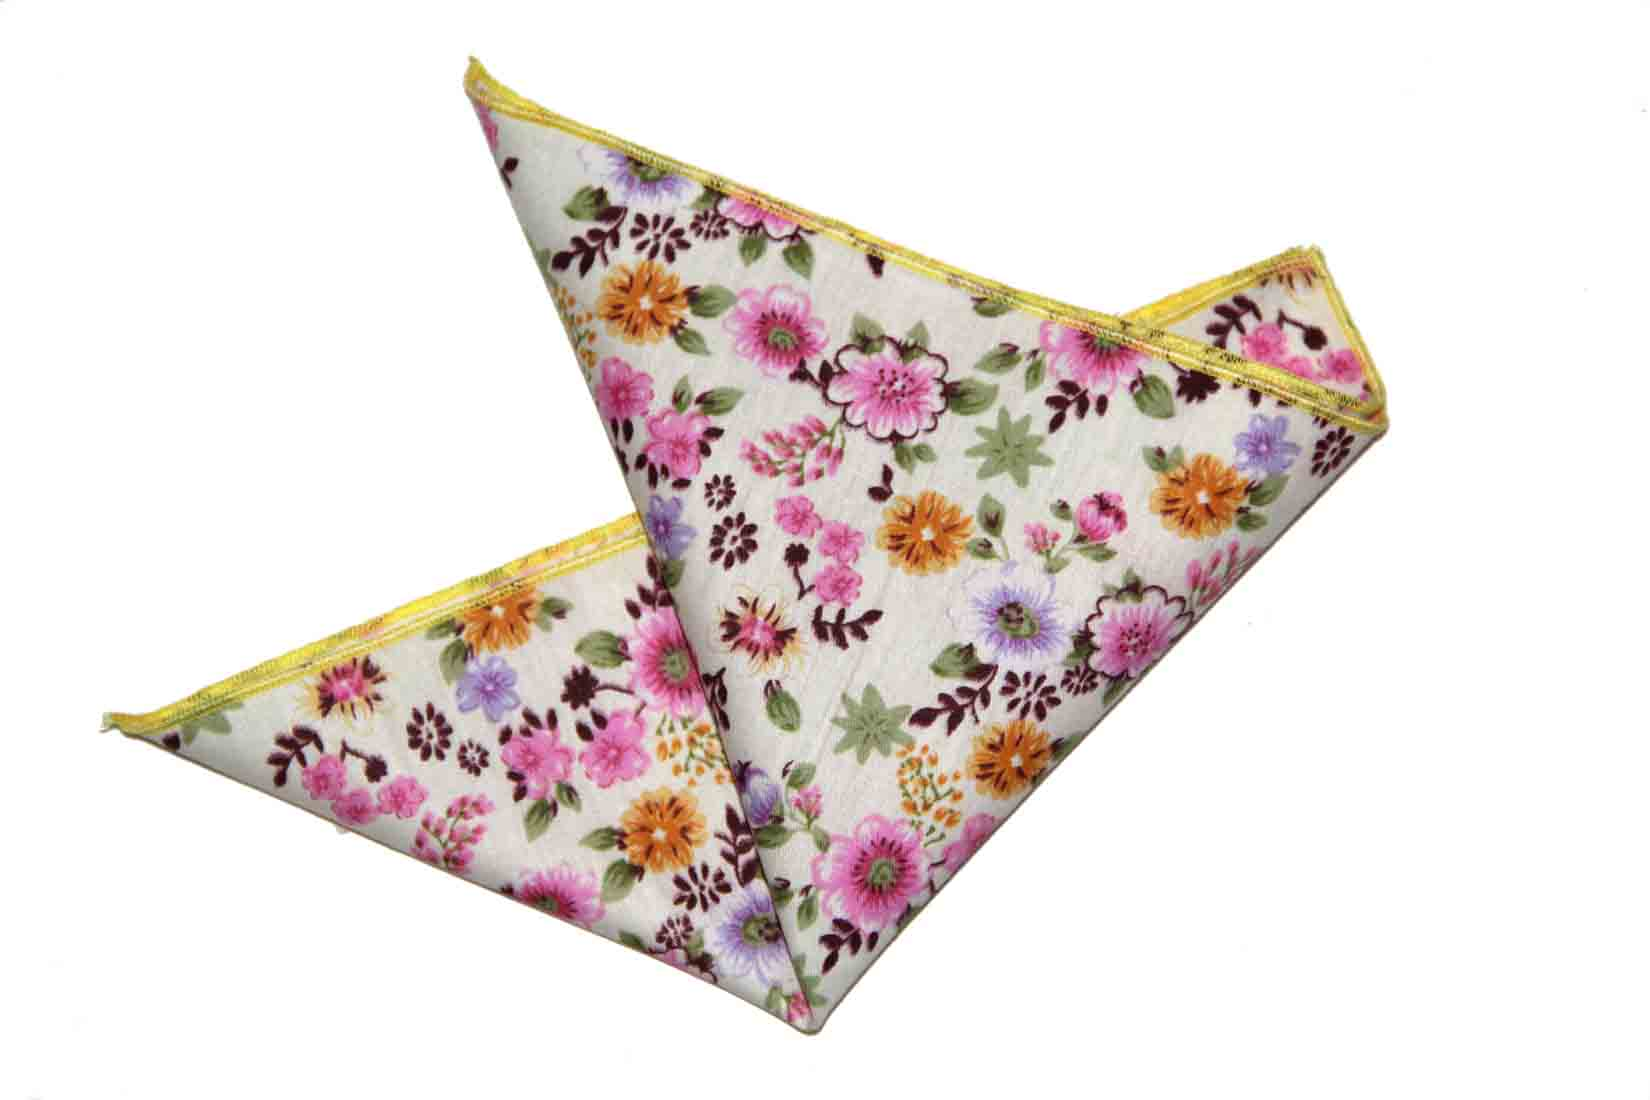 Gascoigne Pocket Square Cotton Floral White Pink Purple Green Orange Lavender Men's